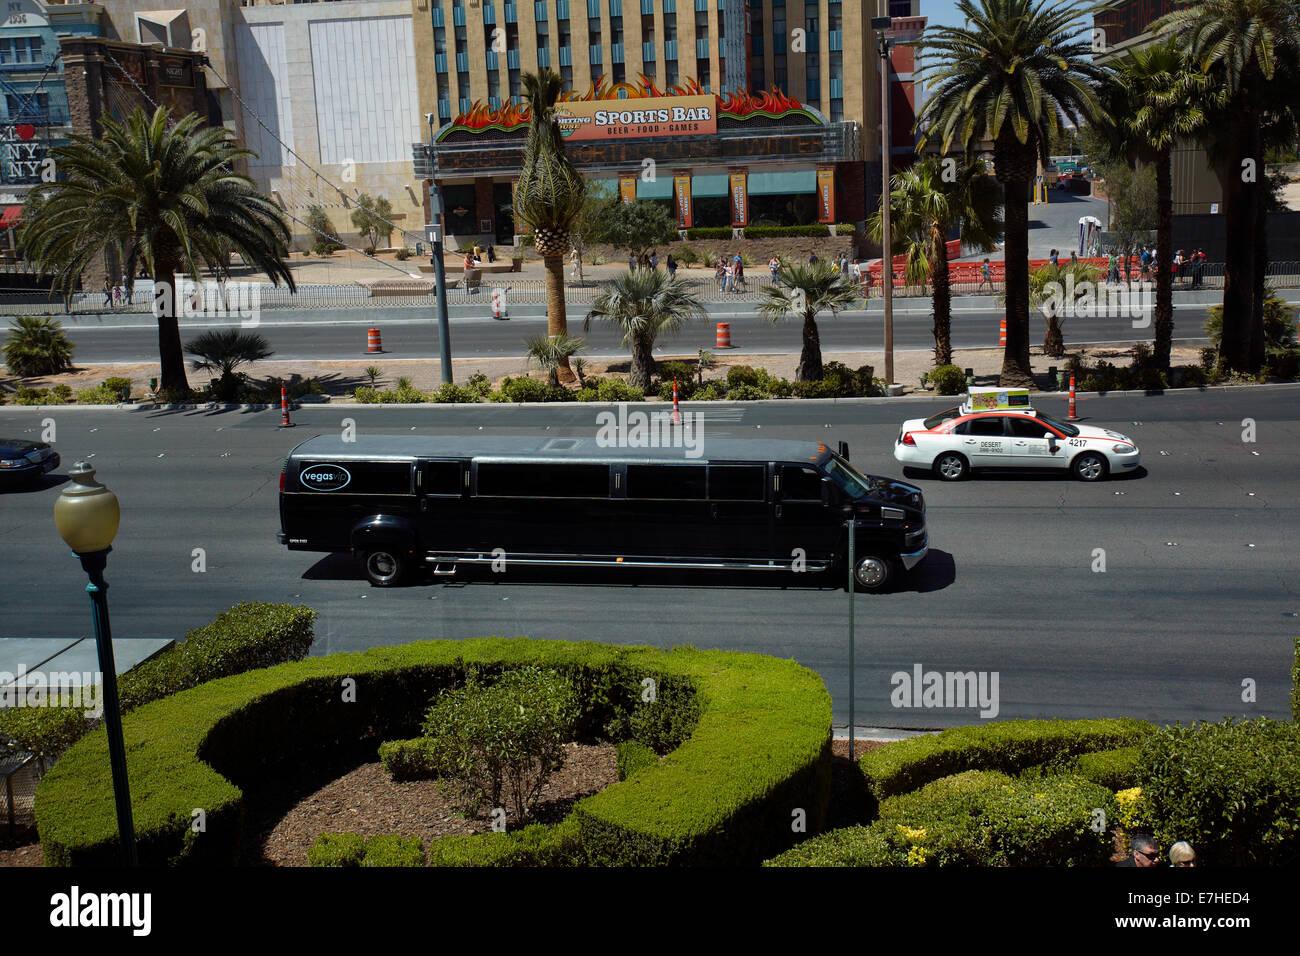 Giant limousine on Las Vegas Boulevard (The Strip), Las Vegas, Nevada, USA - Stock Image